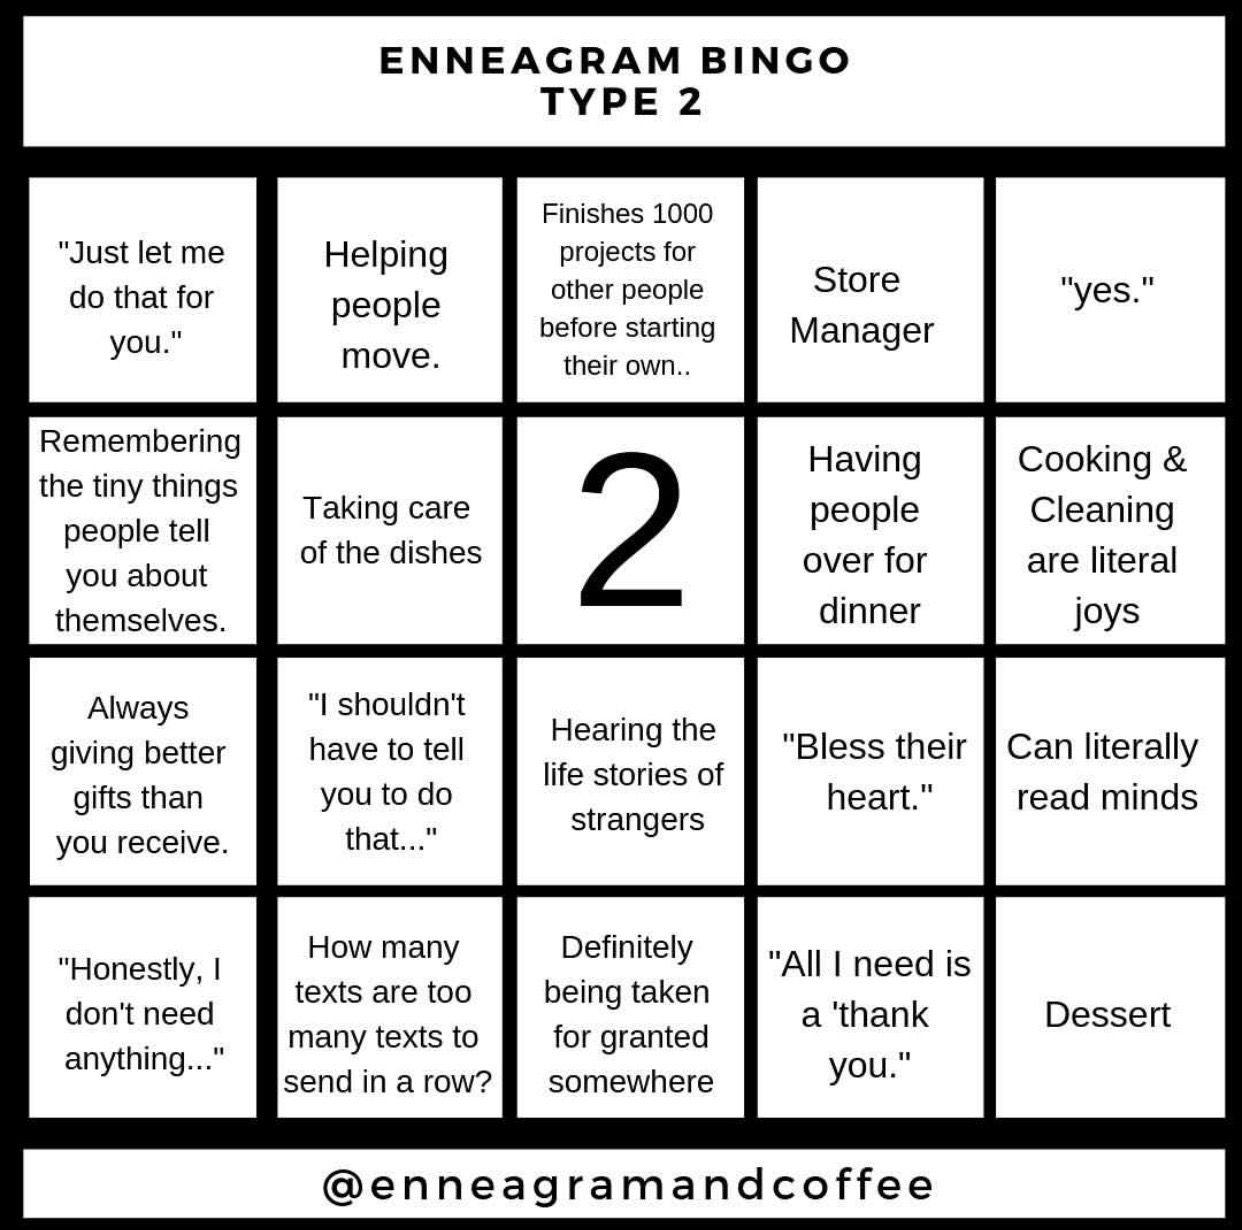 Enneagram Bingo